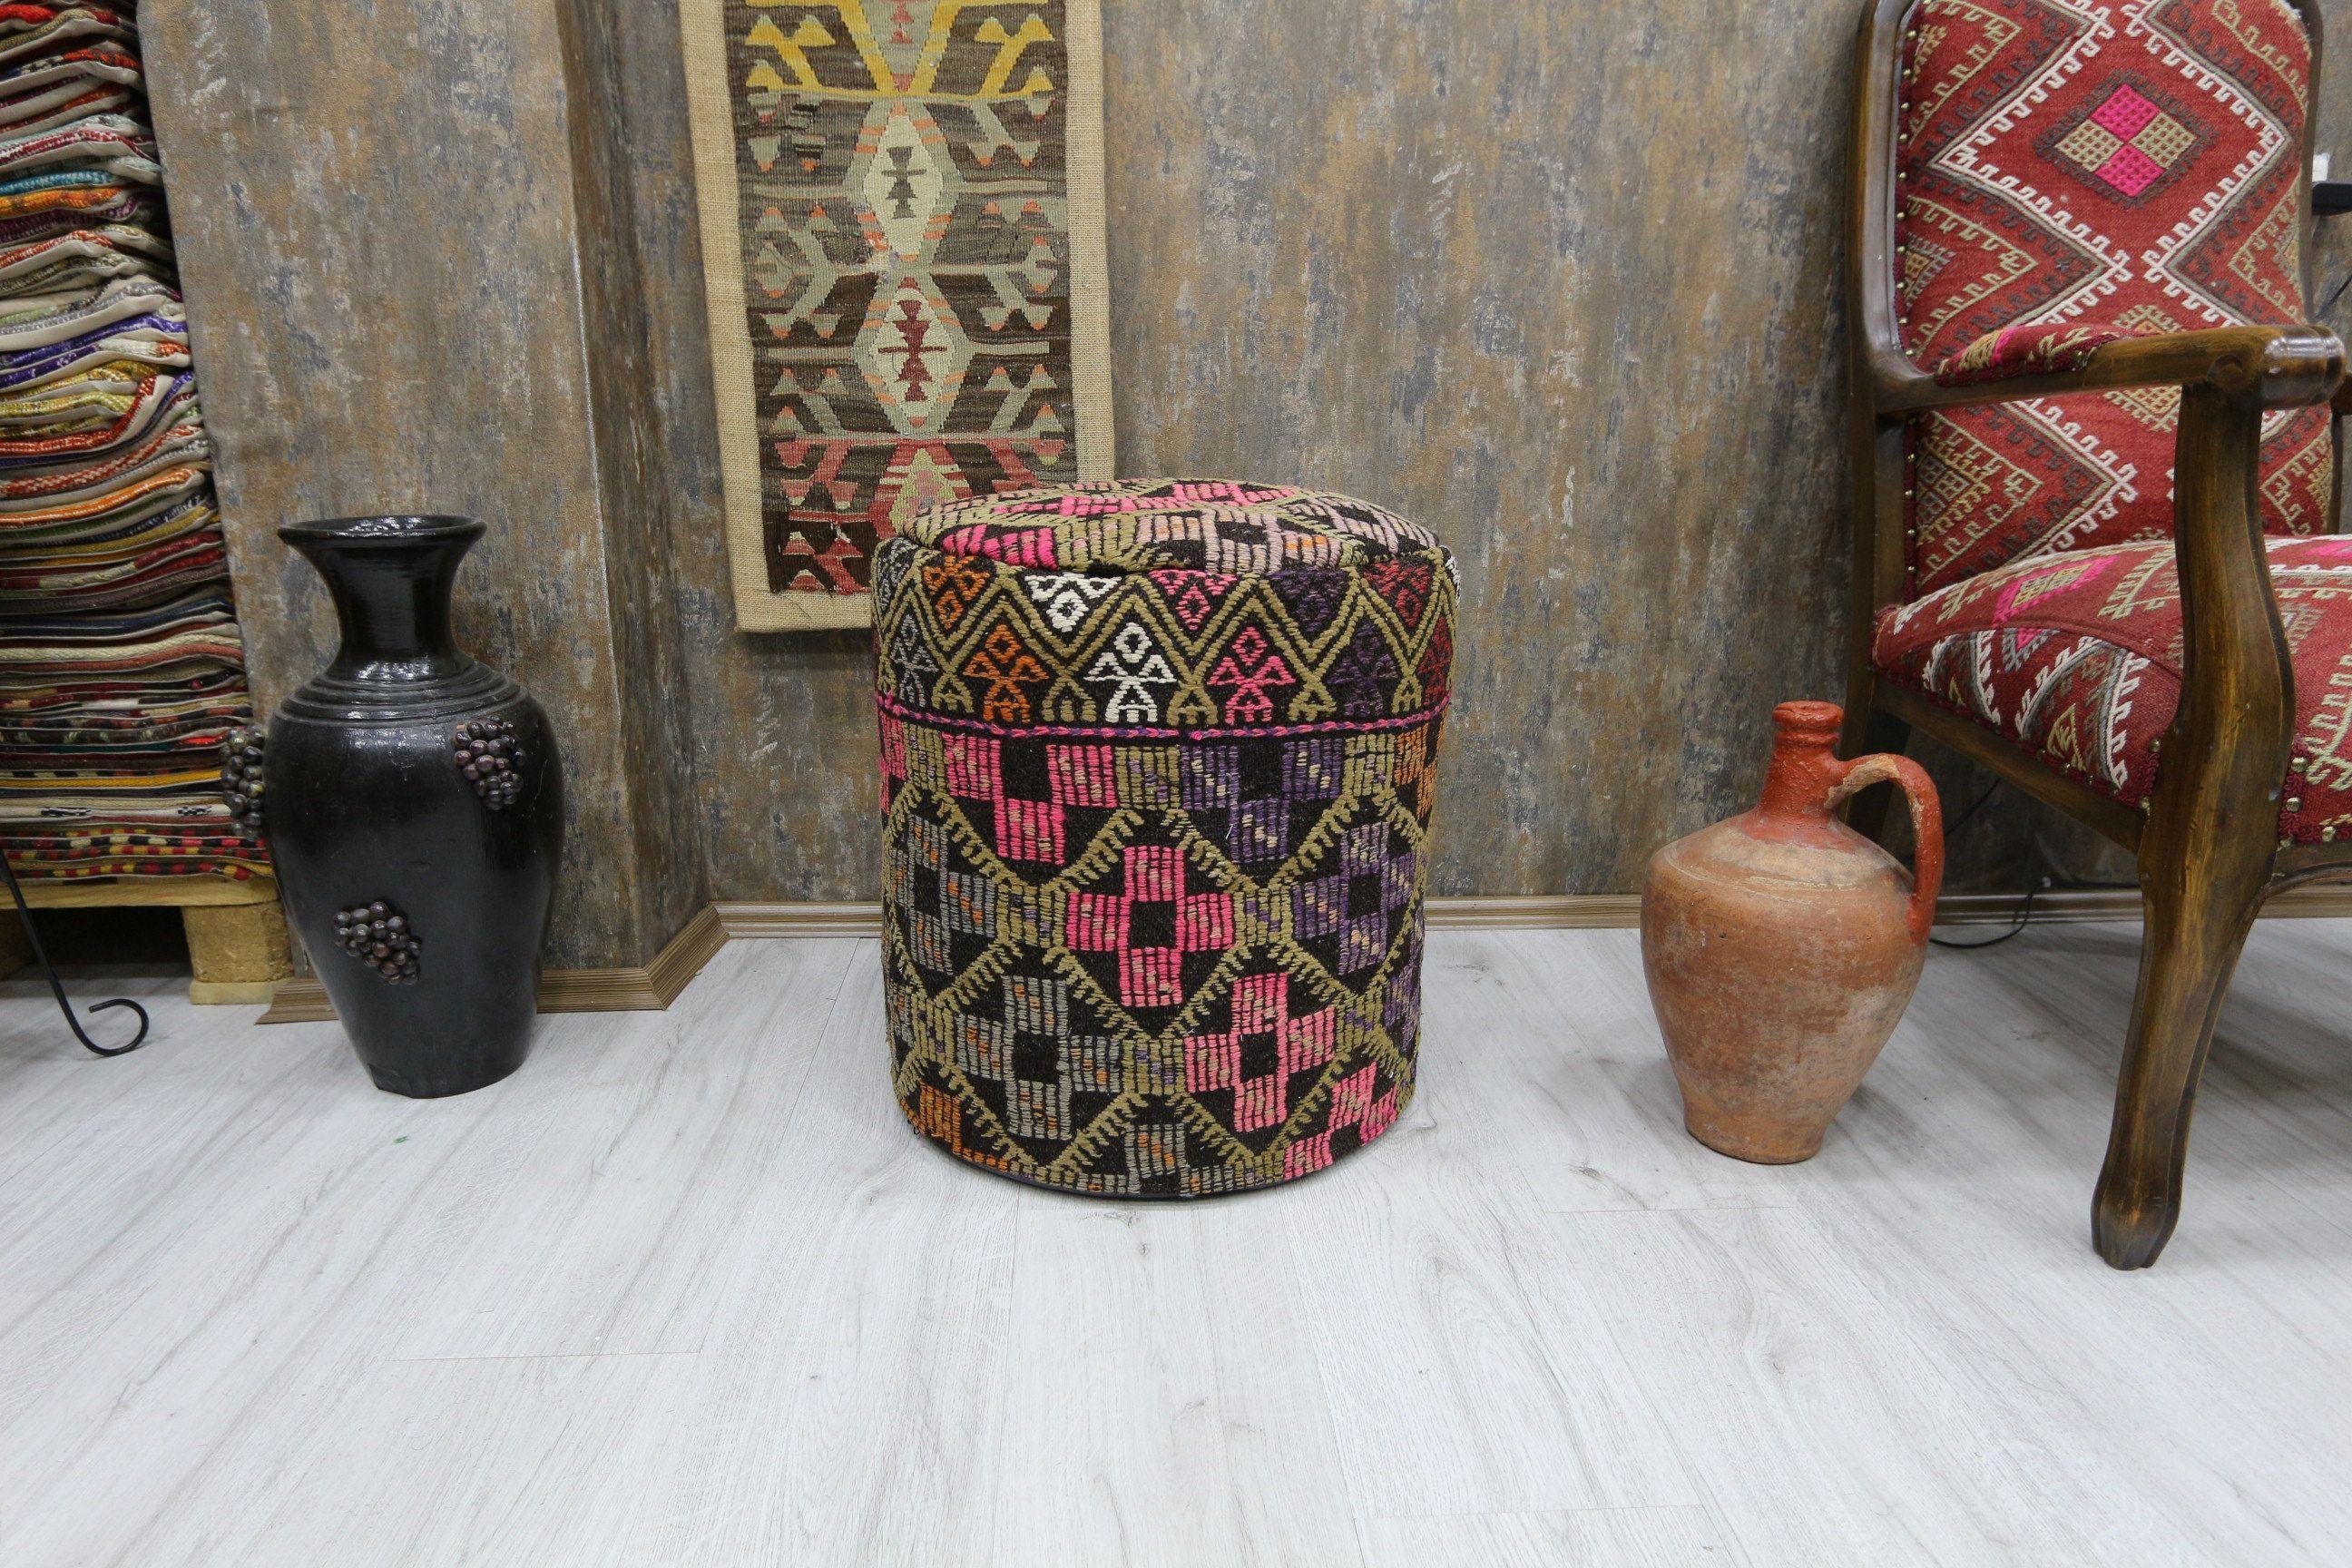 Kilim roud floor pouf brown pouf for living room for kids room ottoman pouf foot stool pouf floor pillow 18x18 kilim,cushion,pouf bean bag